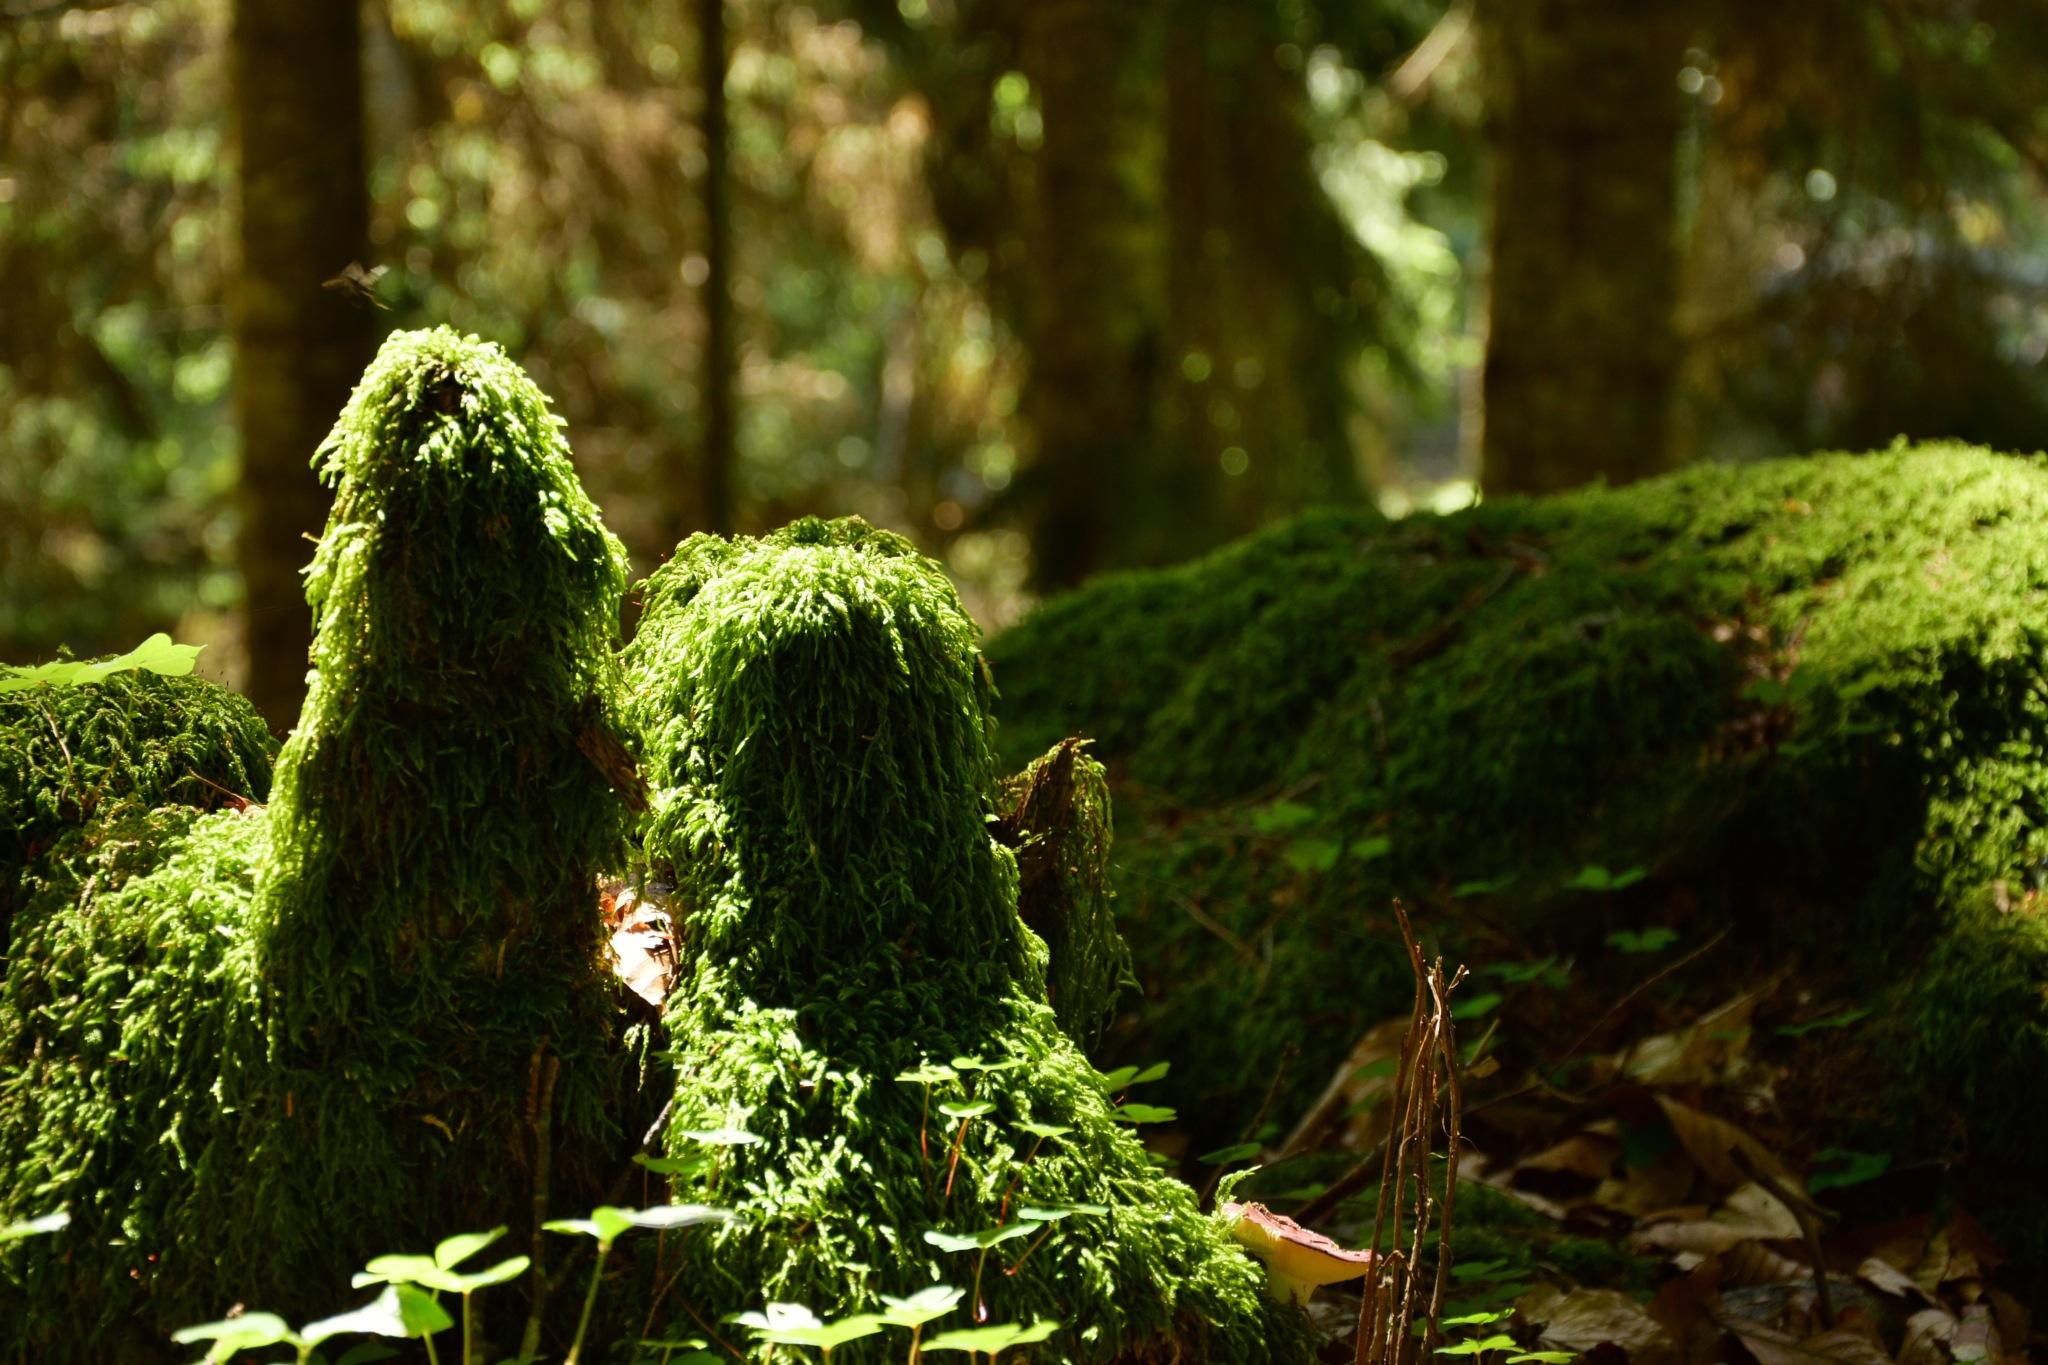 forest brothers by Ramazan Vasilev